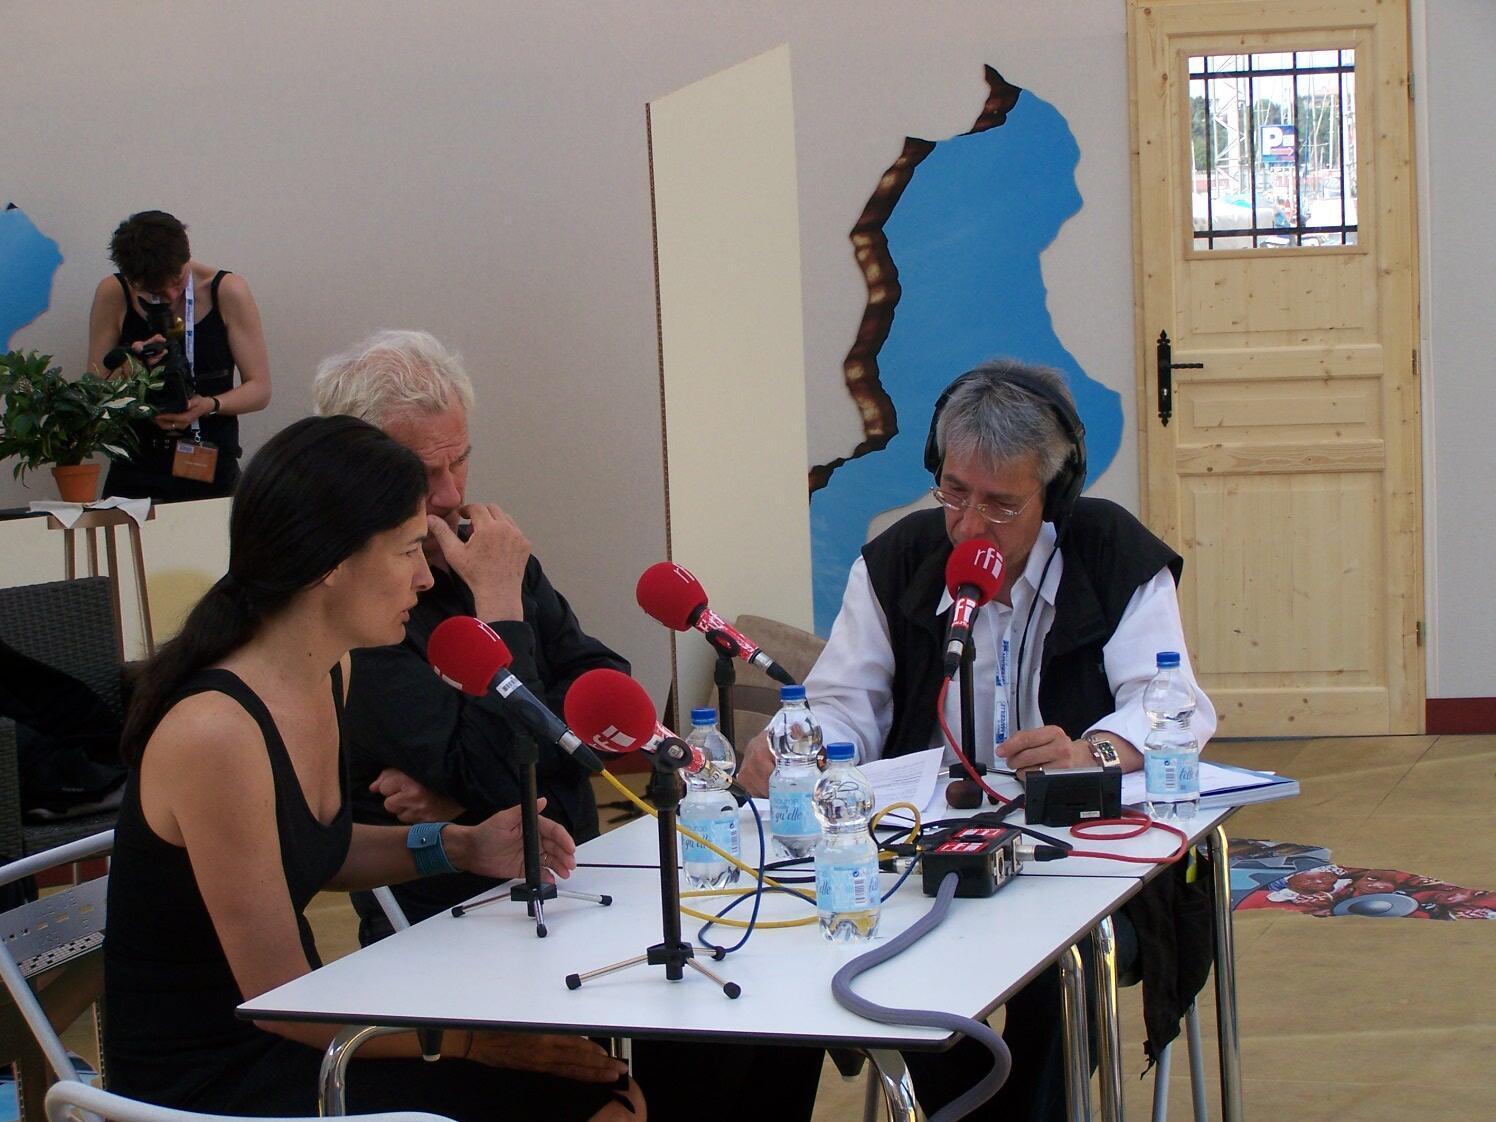 Patricia Ricard, Jacques Rougerie et Jean-Yves Casgha